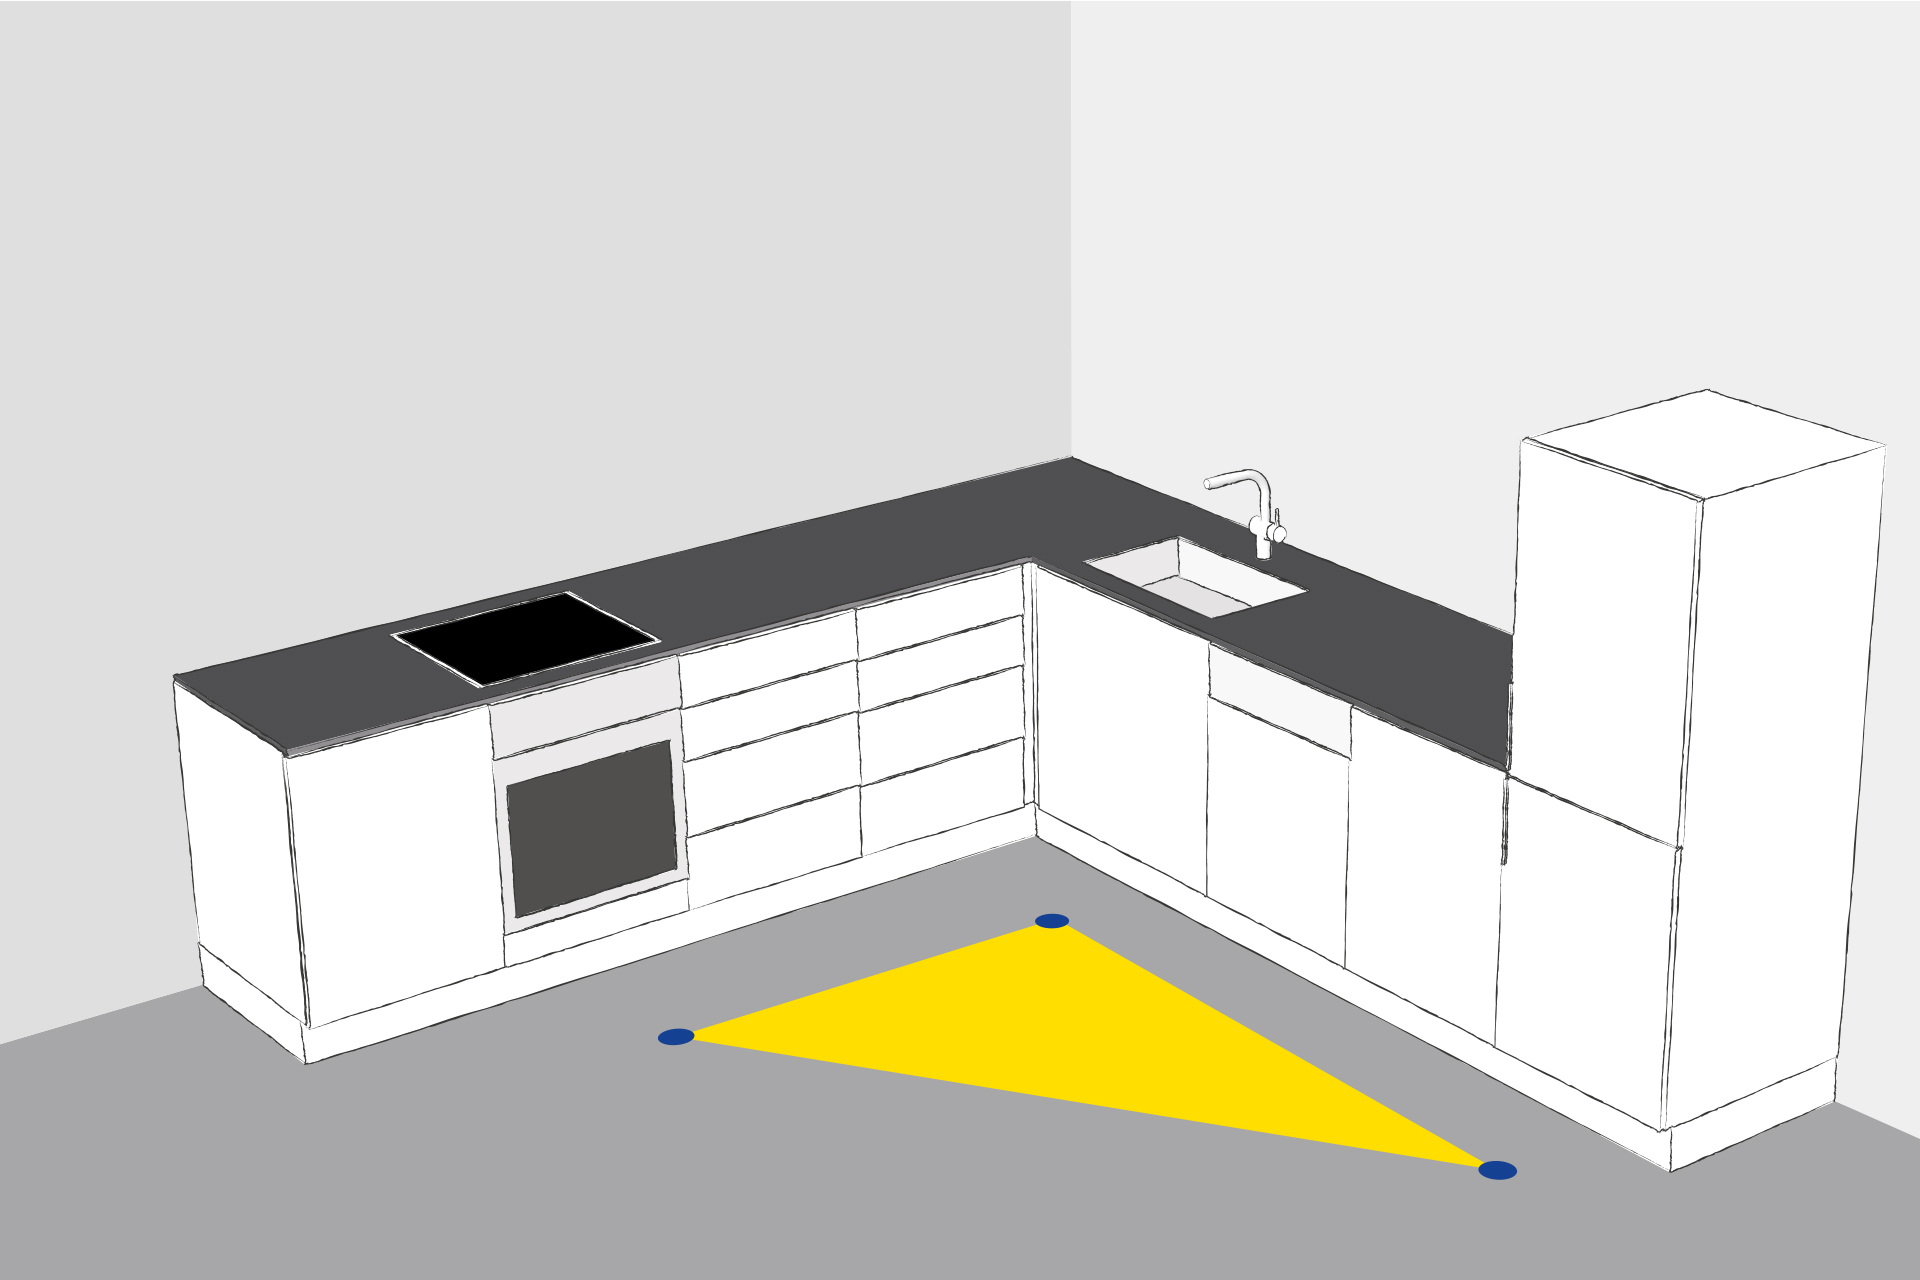 Full Size of Kchen Eckschrank Rondell Bauformat Kche Rhodos In Moonlight Küchen Regal Bad Küche Schlafzimmer Wohnzimmer Küchen Eckschrank Rondell